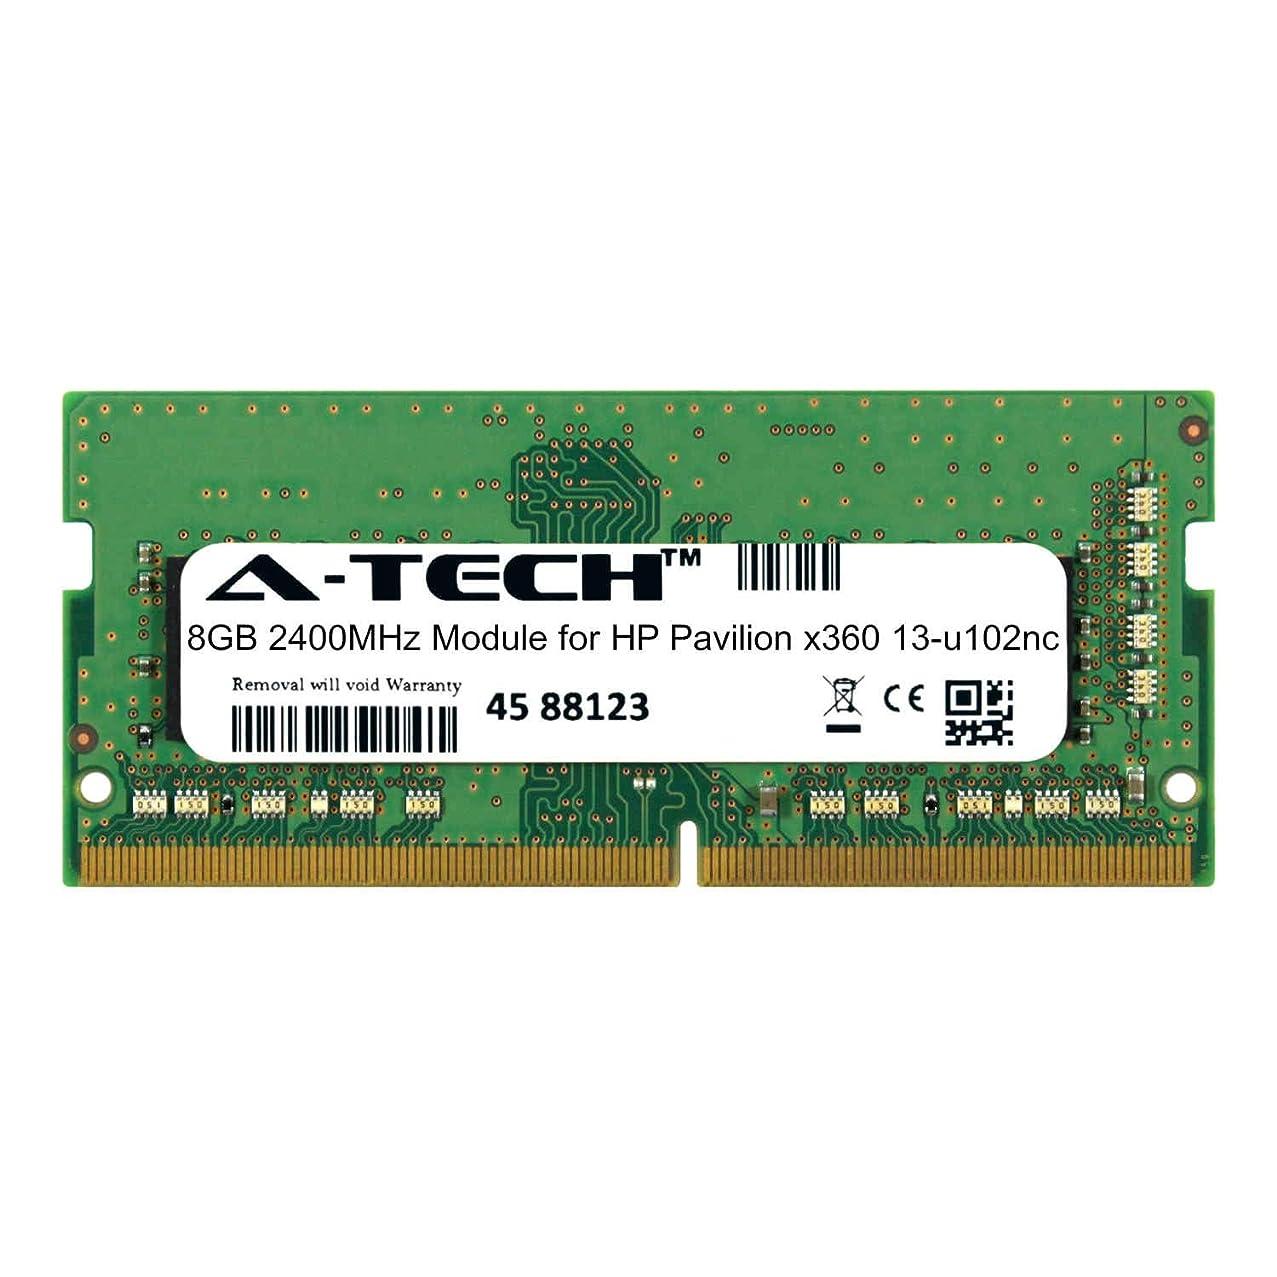 A-Tech 8GB Module for HP Pavilion x360 13-u102nc Laptop & Notebook Compatible DDR4 2400Mhz Memory Ram (ATMS312620A25827X1)